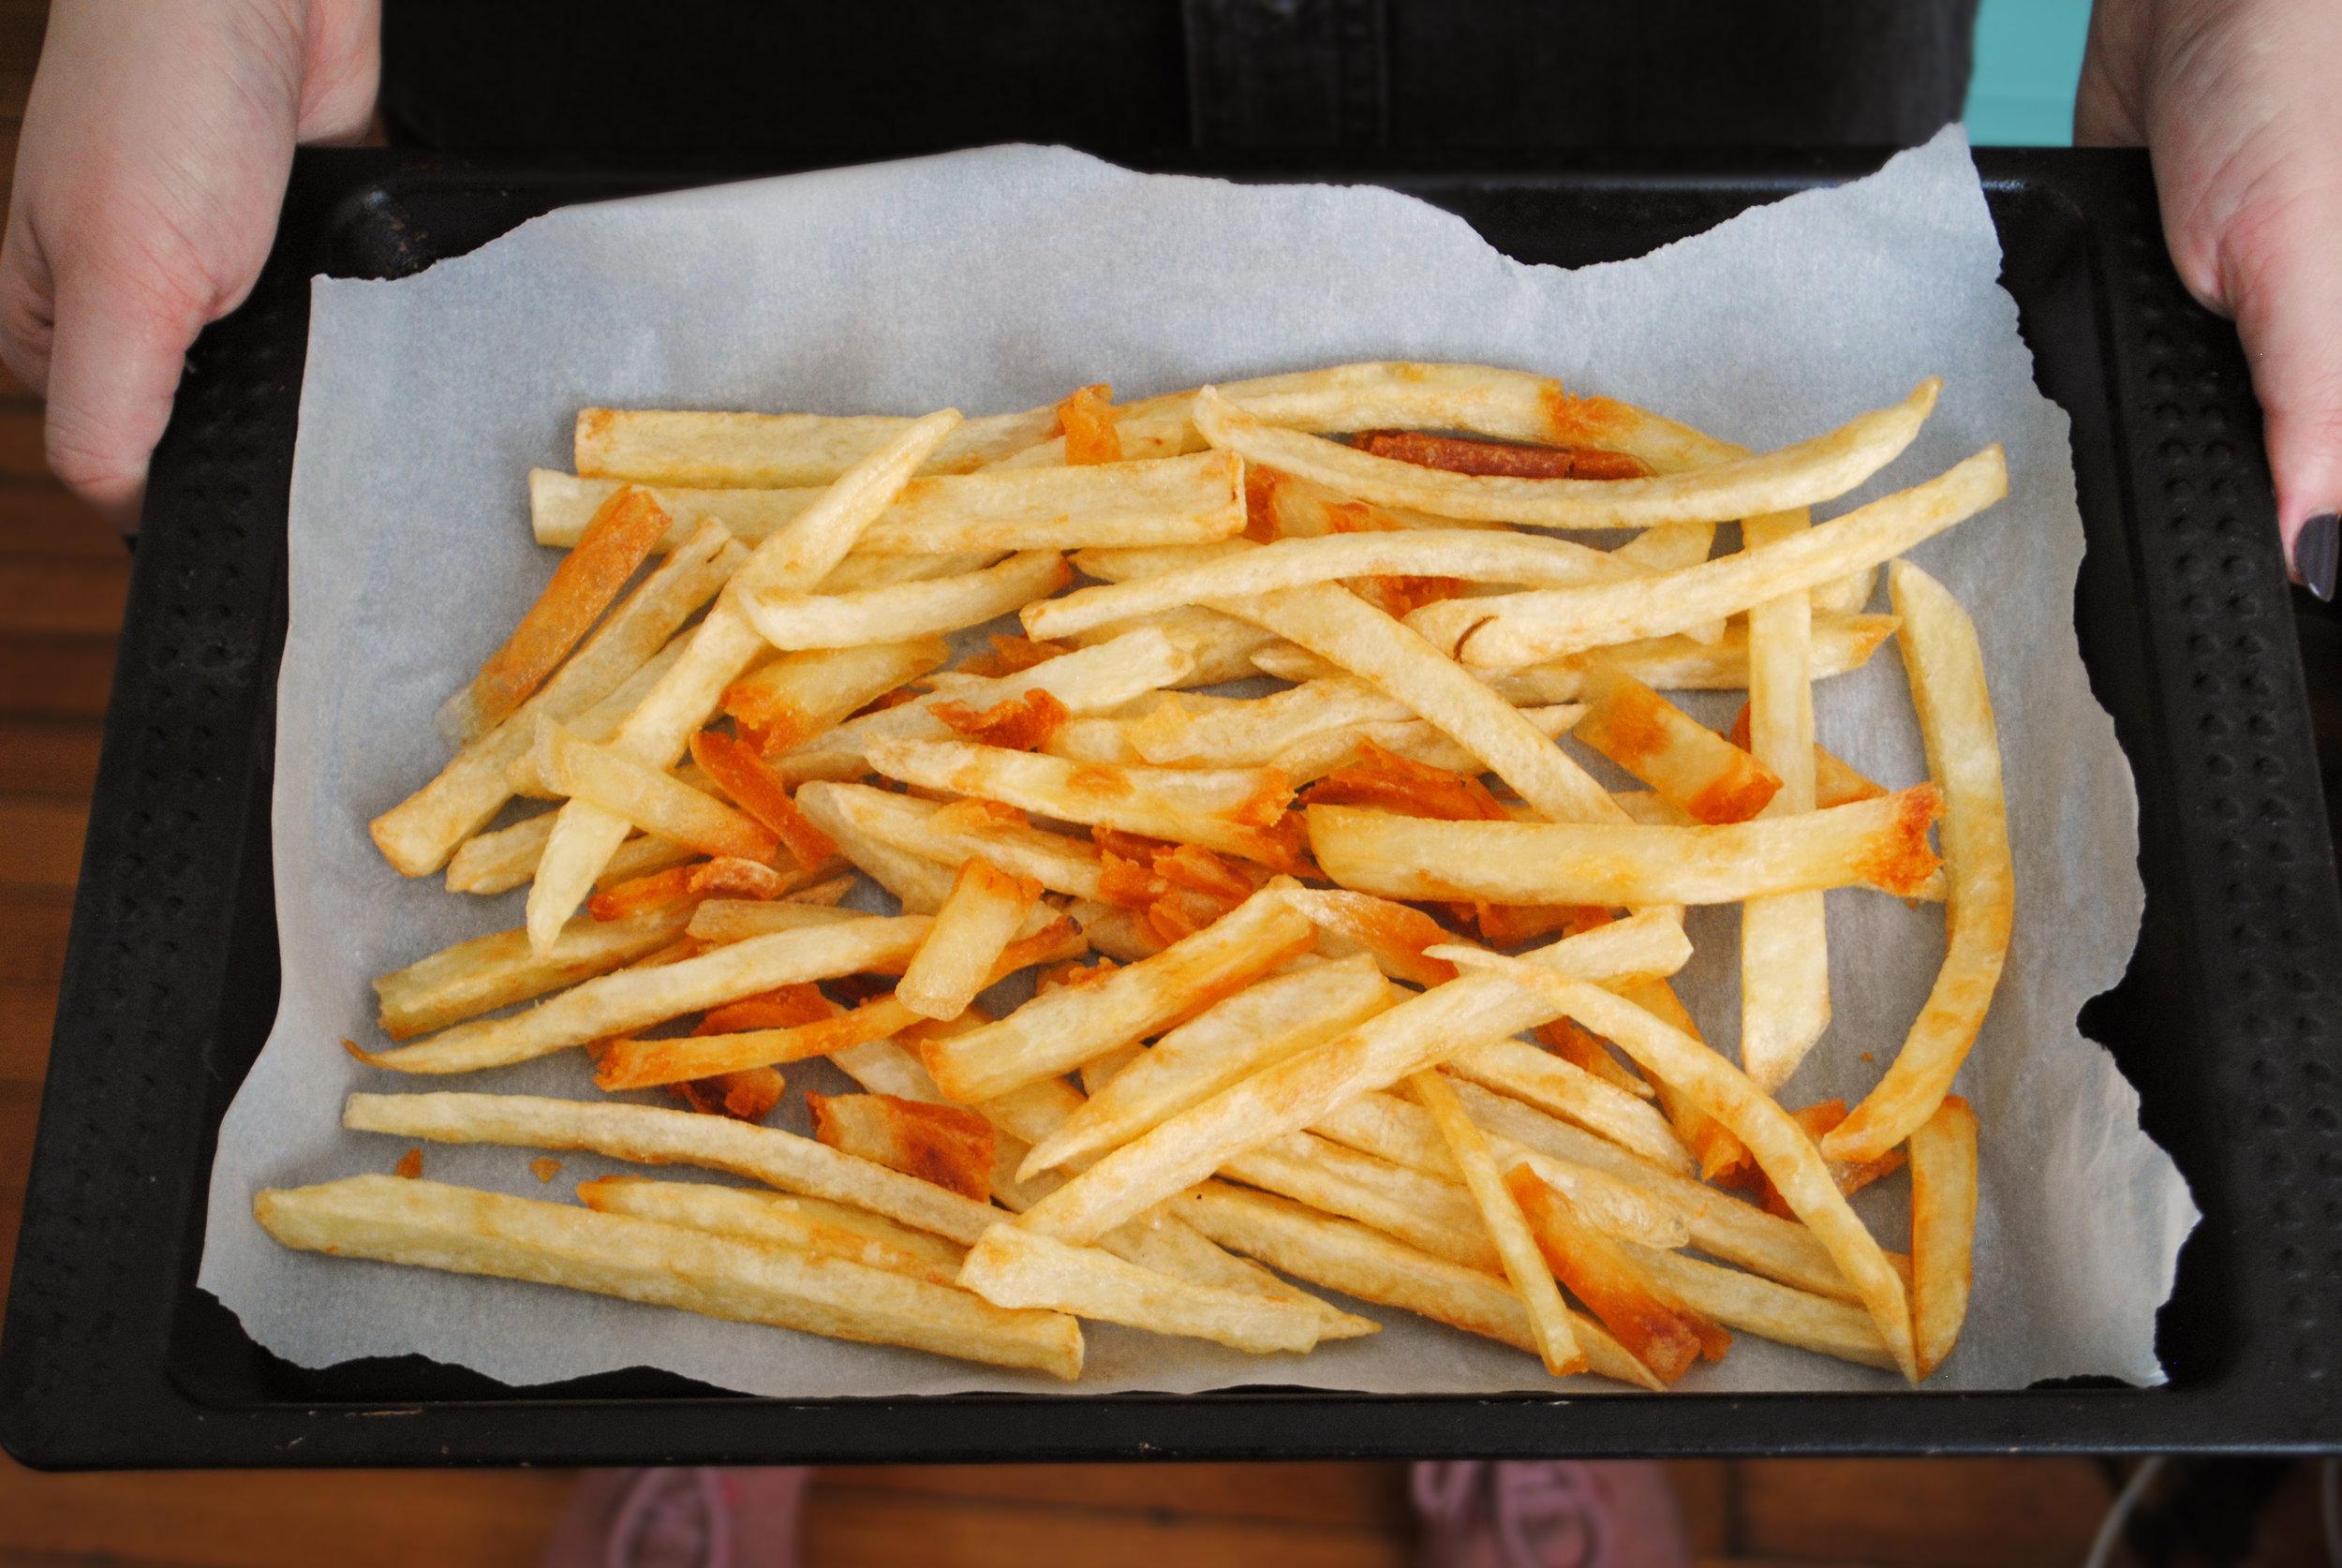 fries_edited-1.jpg